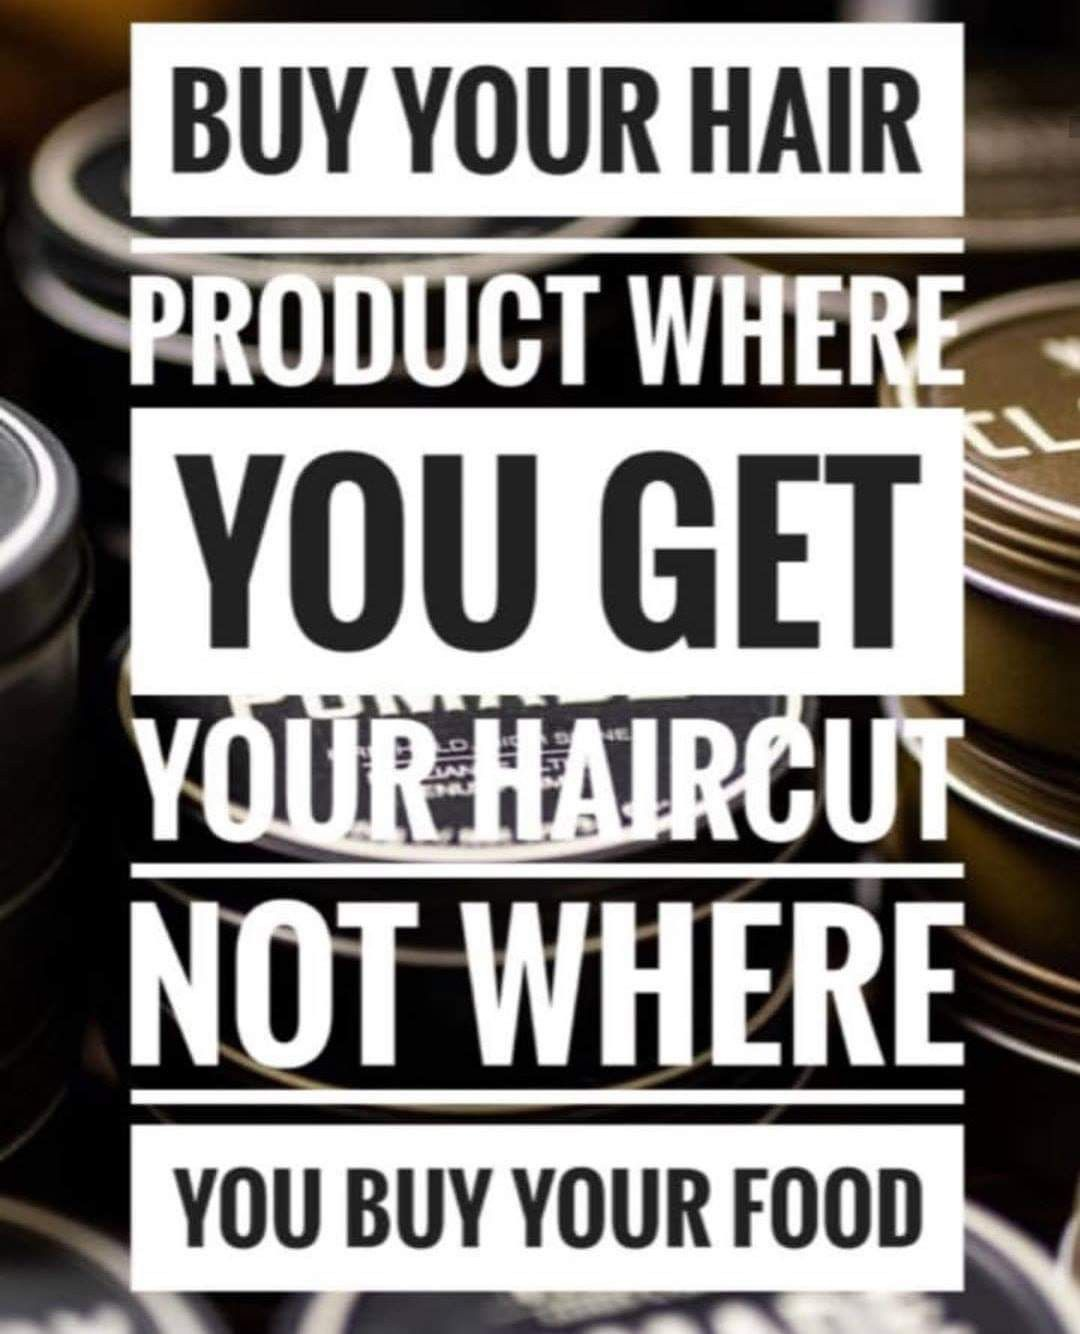 Bowl Cut Haircut Meme